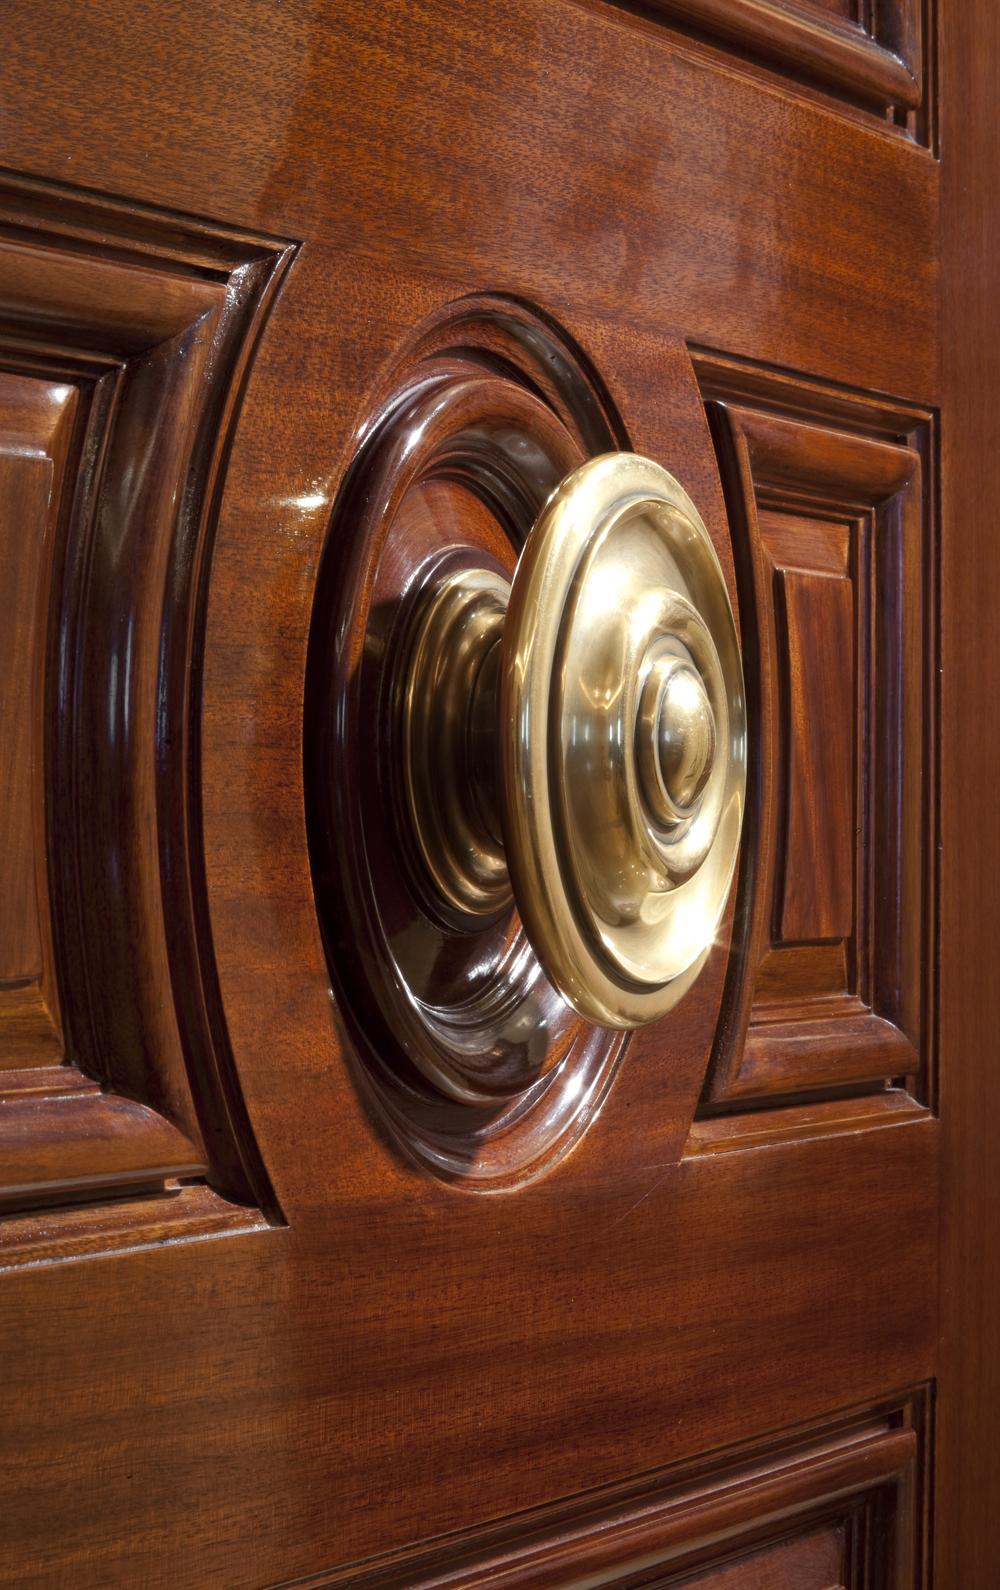 LSI-web-fifth-ave-interior-detail-door-2.jpg